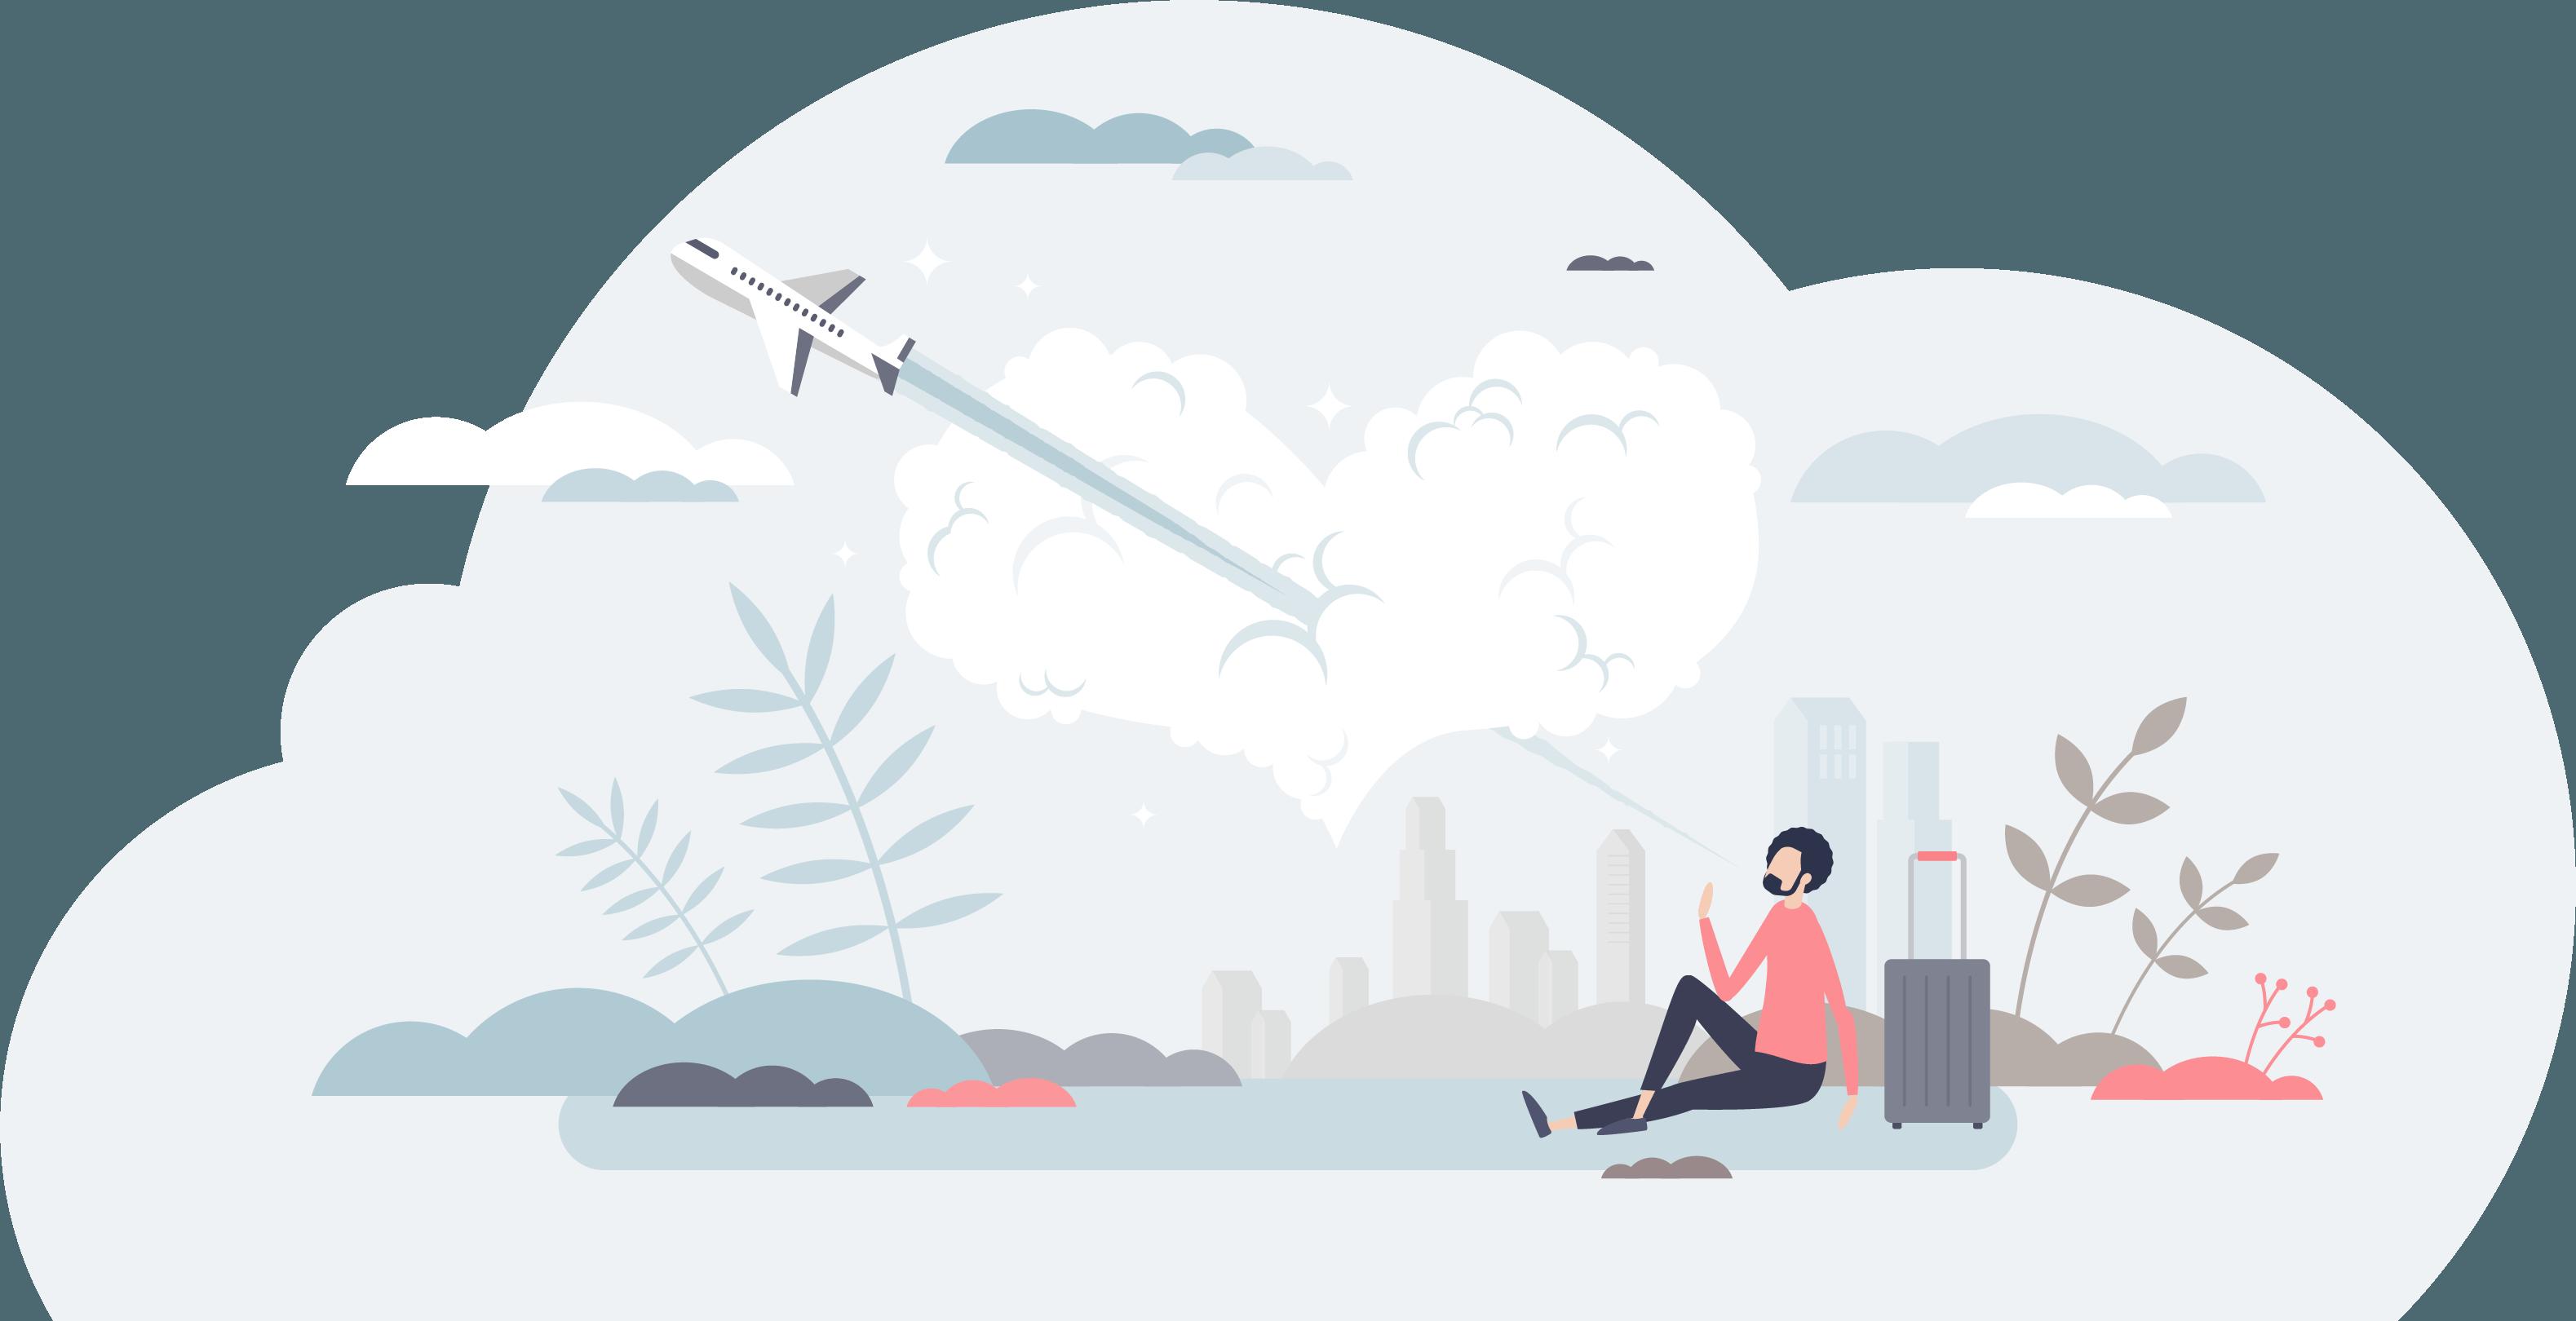 Illustrated Plane Image